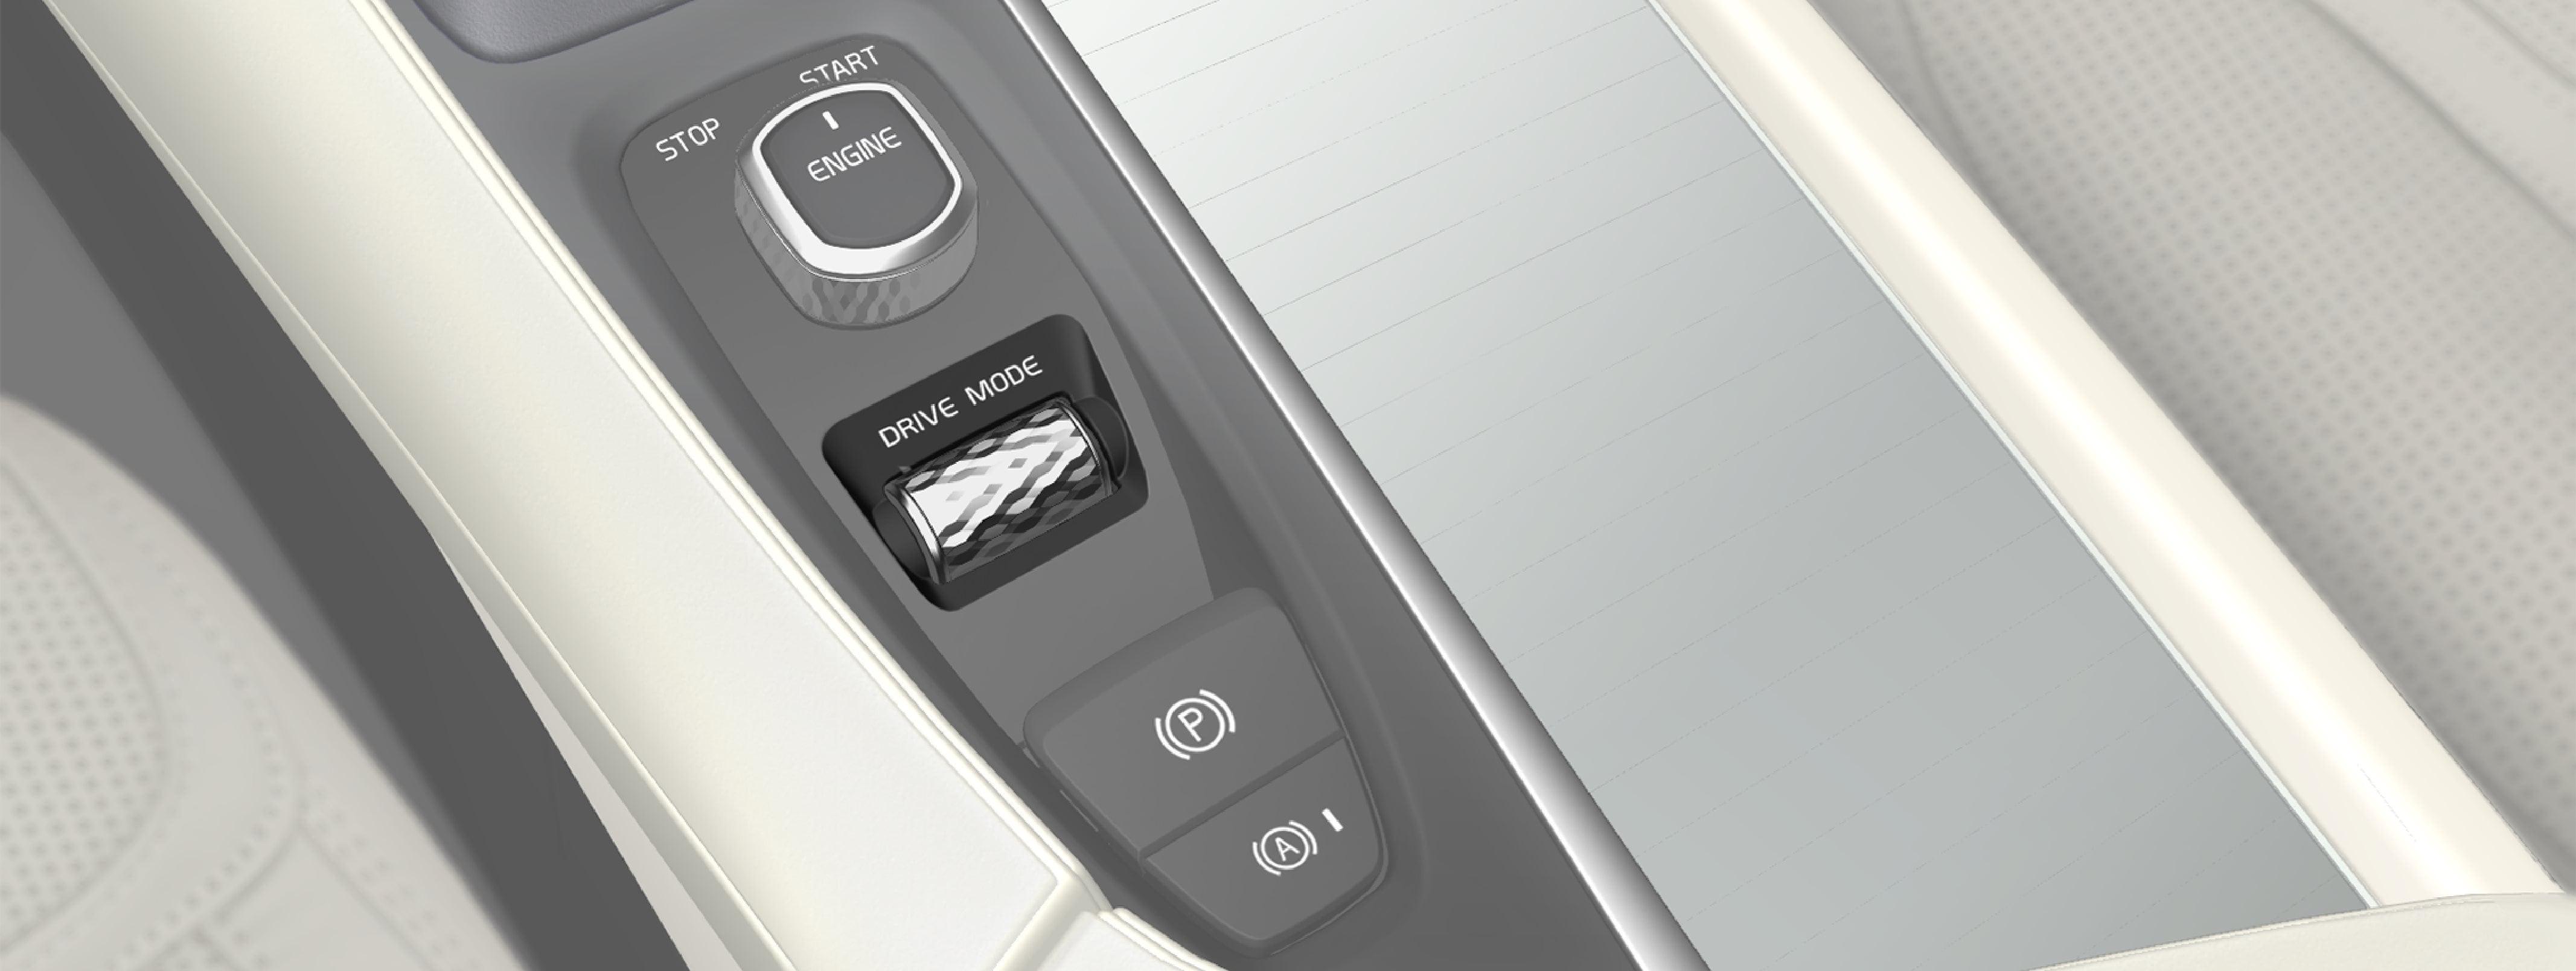 P5-1507-drive mode scroll wheel